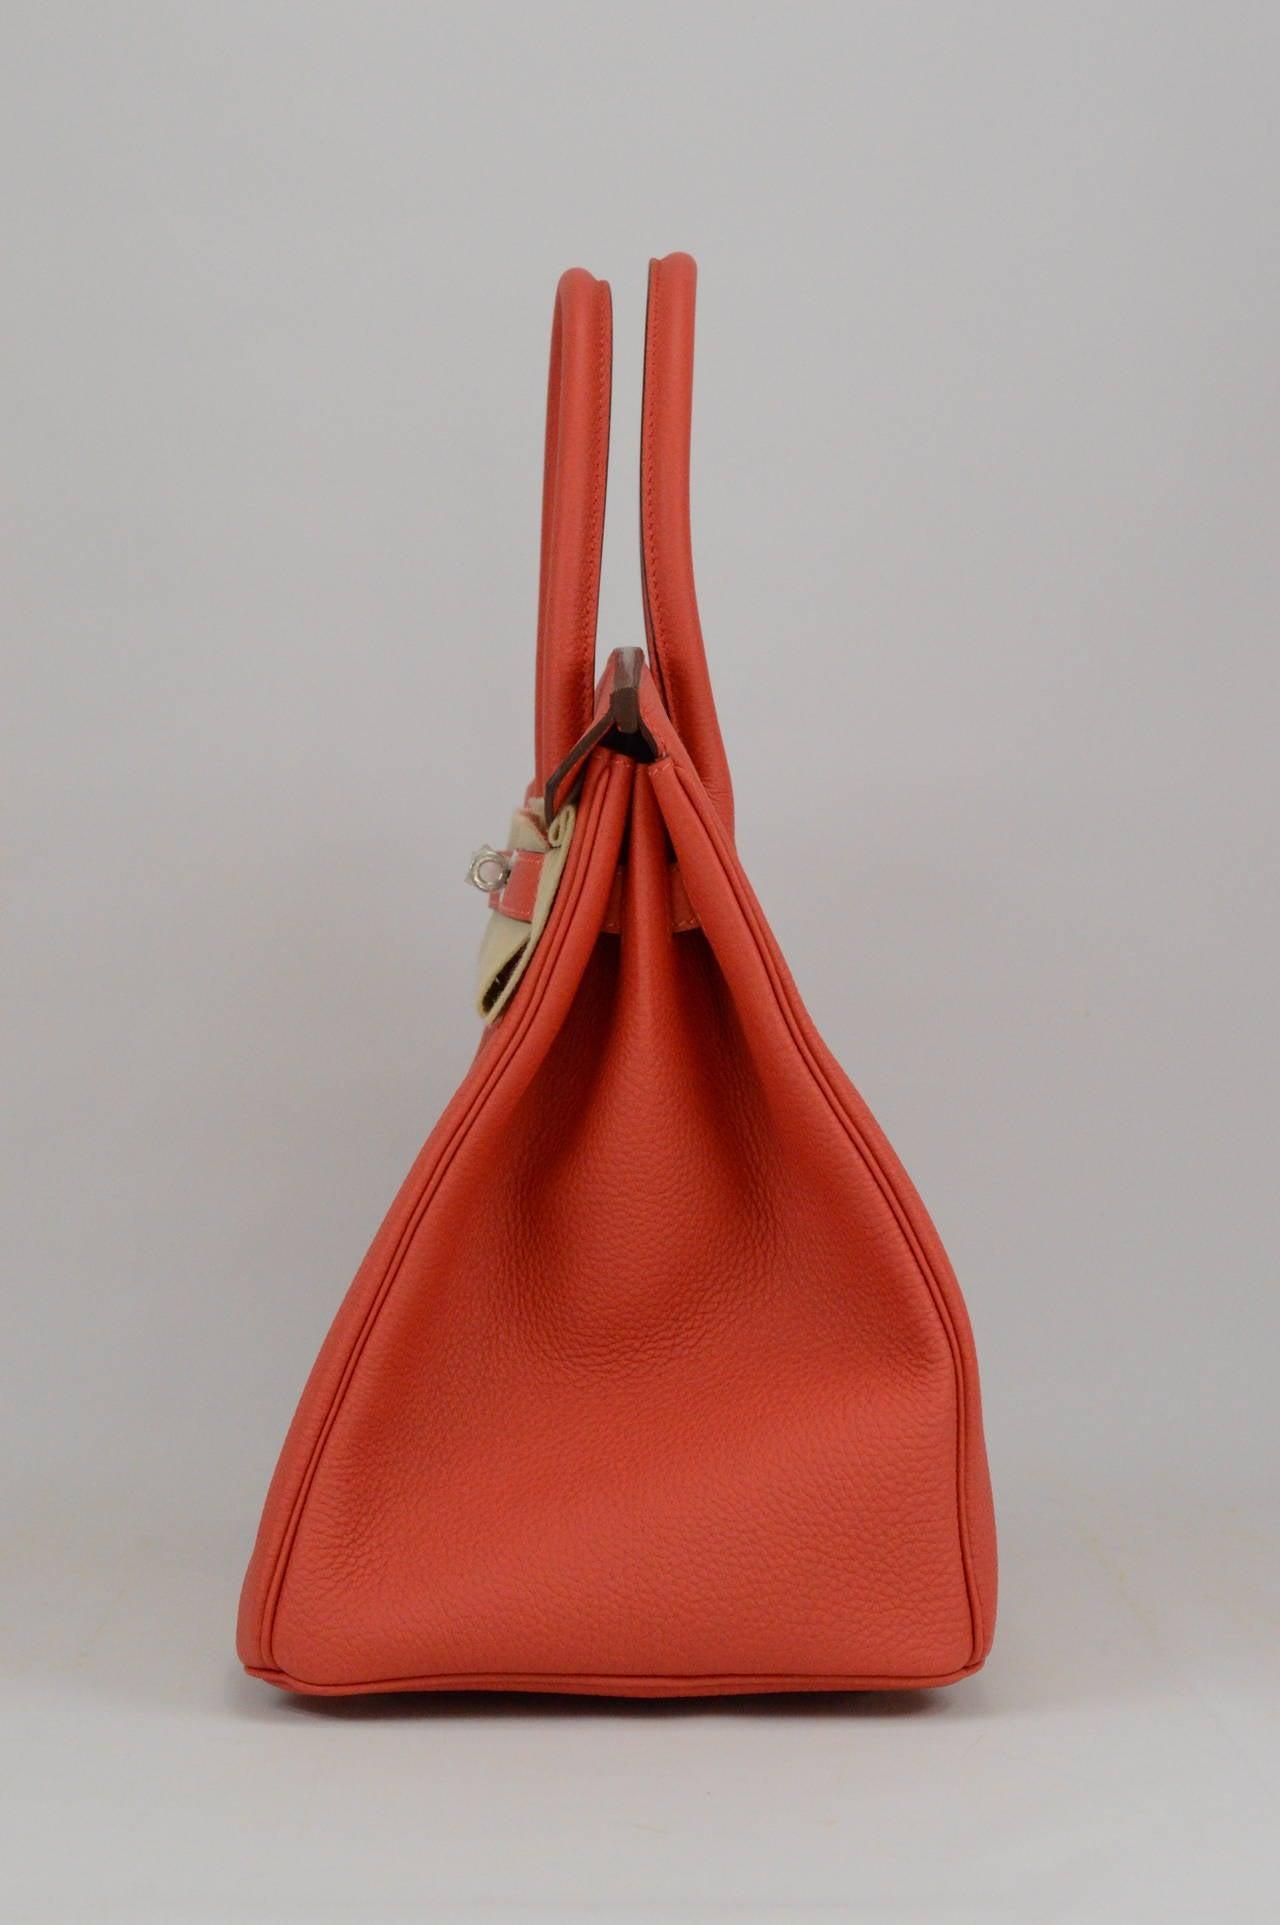 hermes lindy bag sizes - 2014 Hermes Birkin Bag 35 Rouge Pivoine Togo Leather Palladium ...